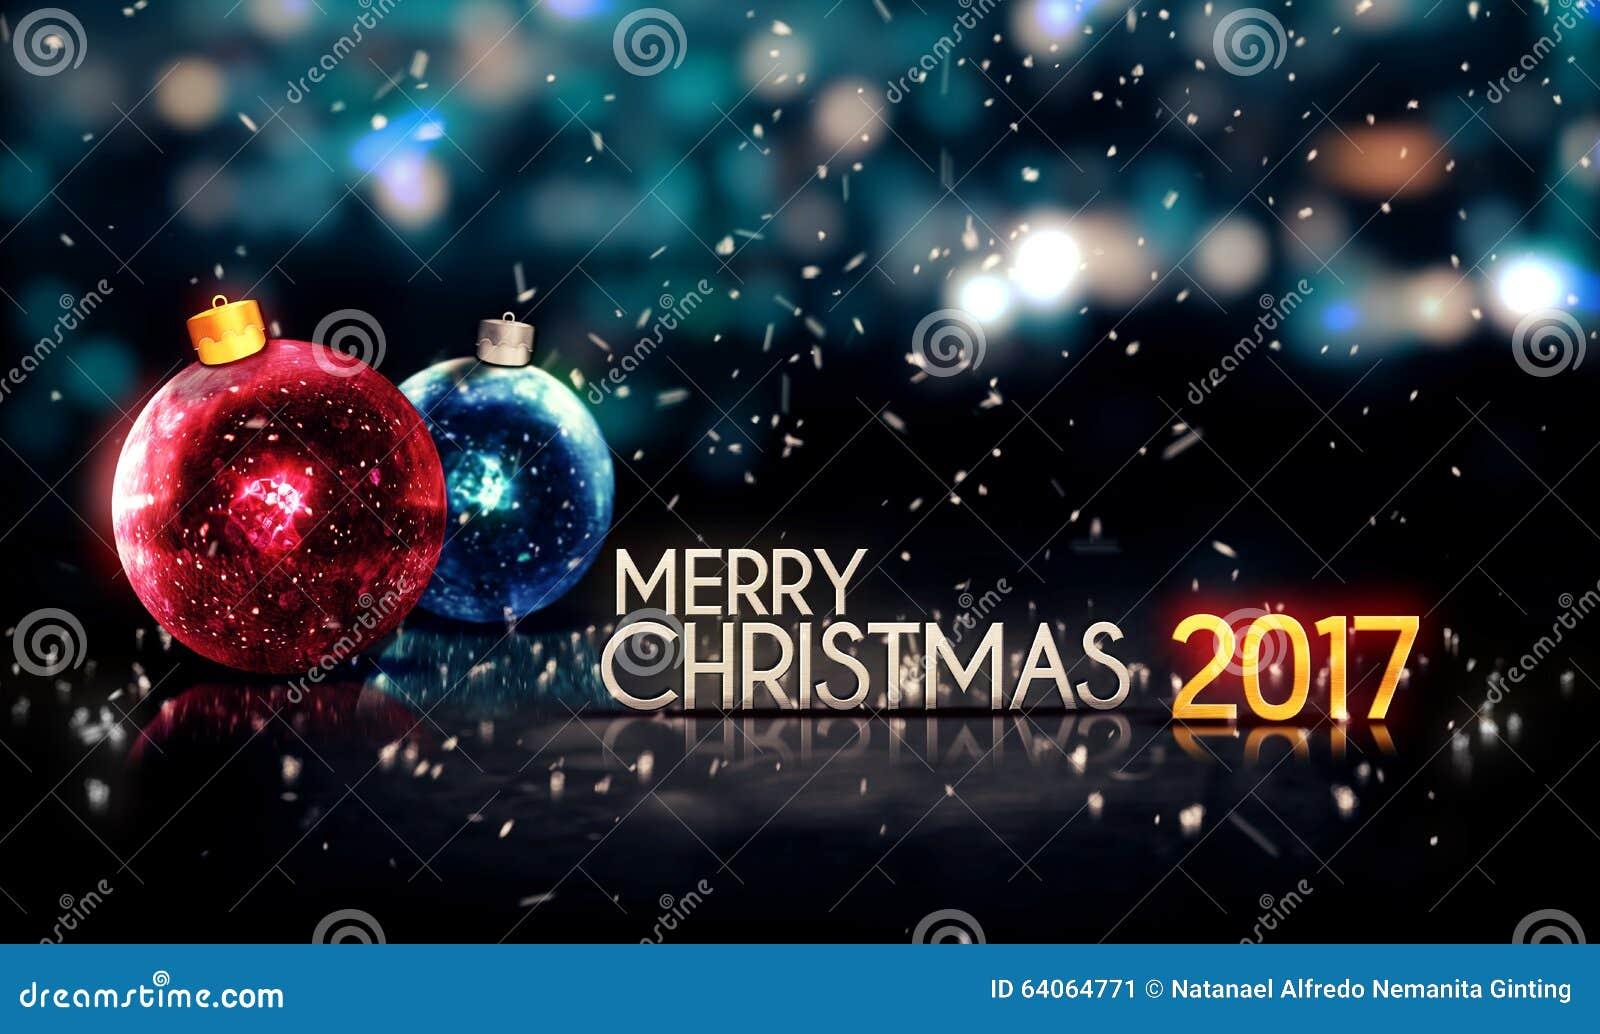 Merry Christmas 2017 Night Bokeh Beautiful 3D Background Digital Art ...